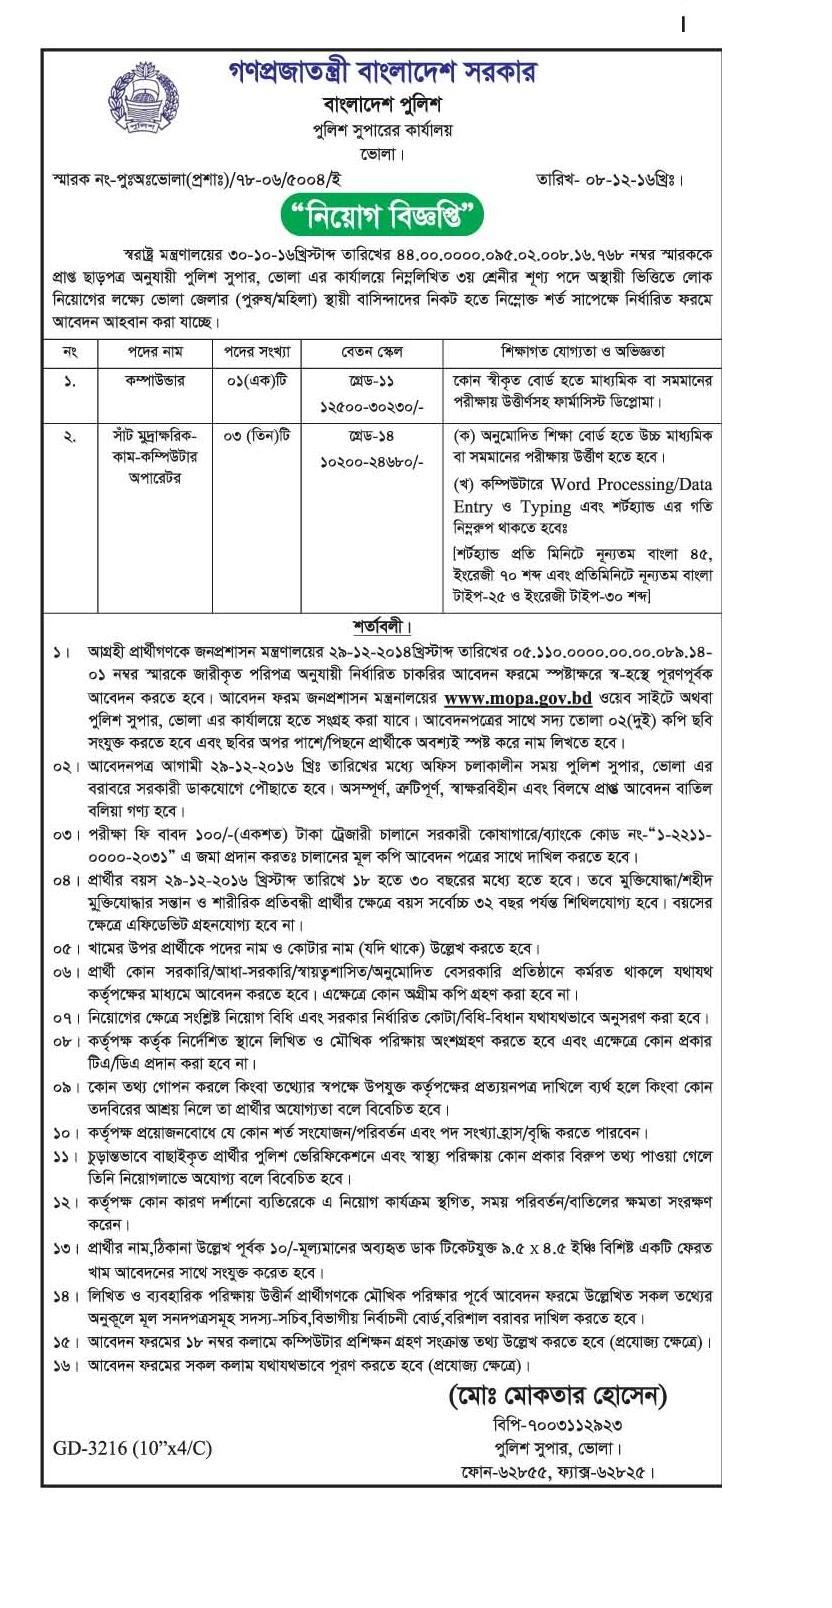 Bangladesh Police Job Circular December 2016.